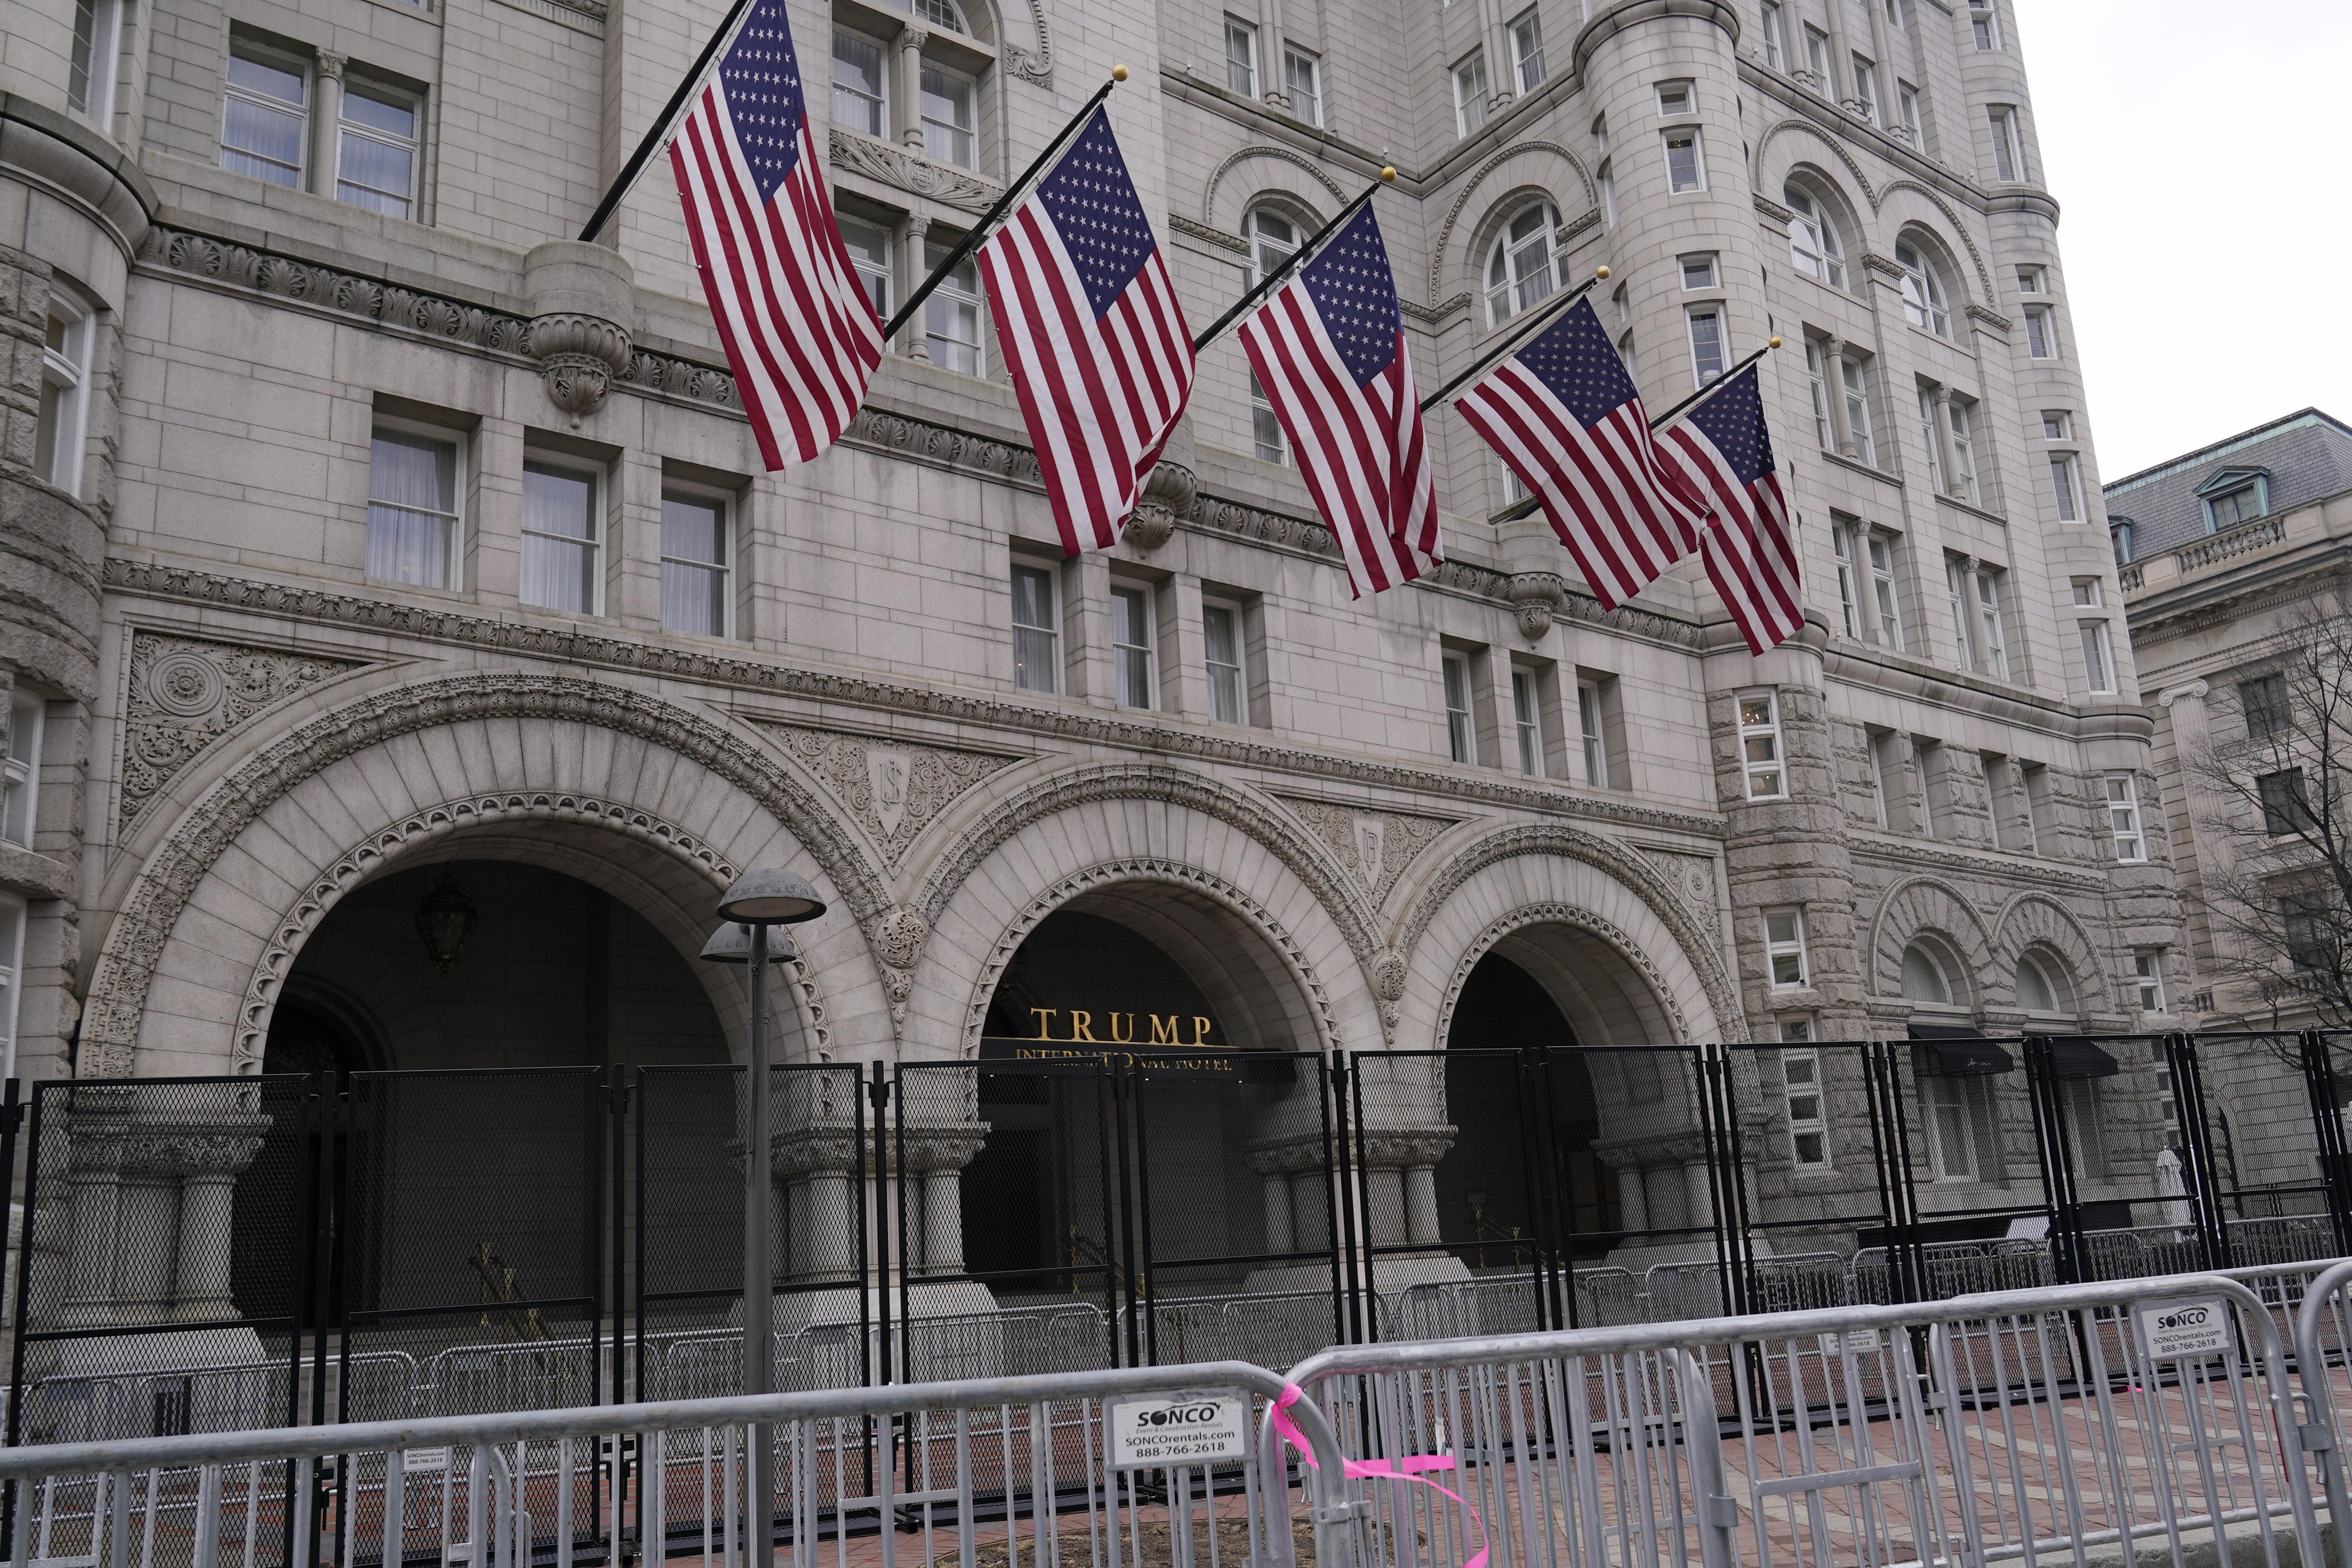 Trump Hotel in Washington